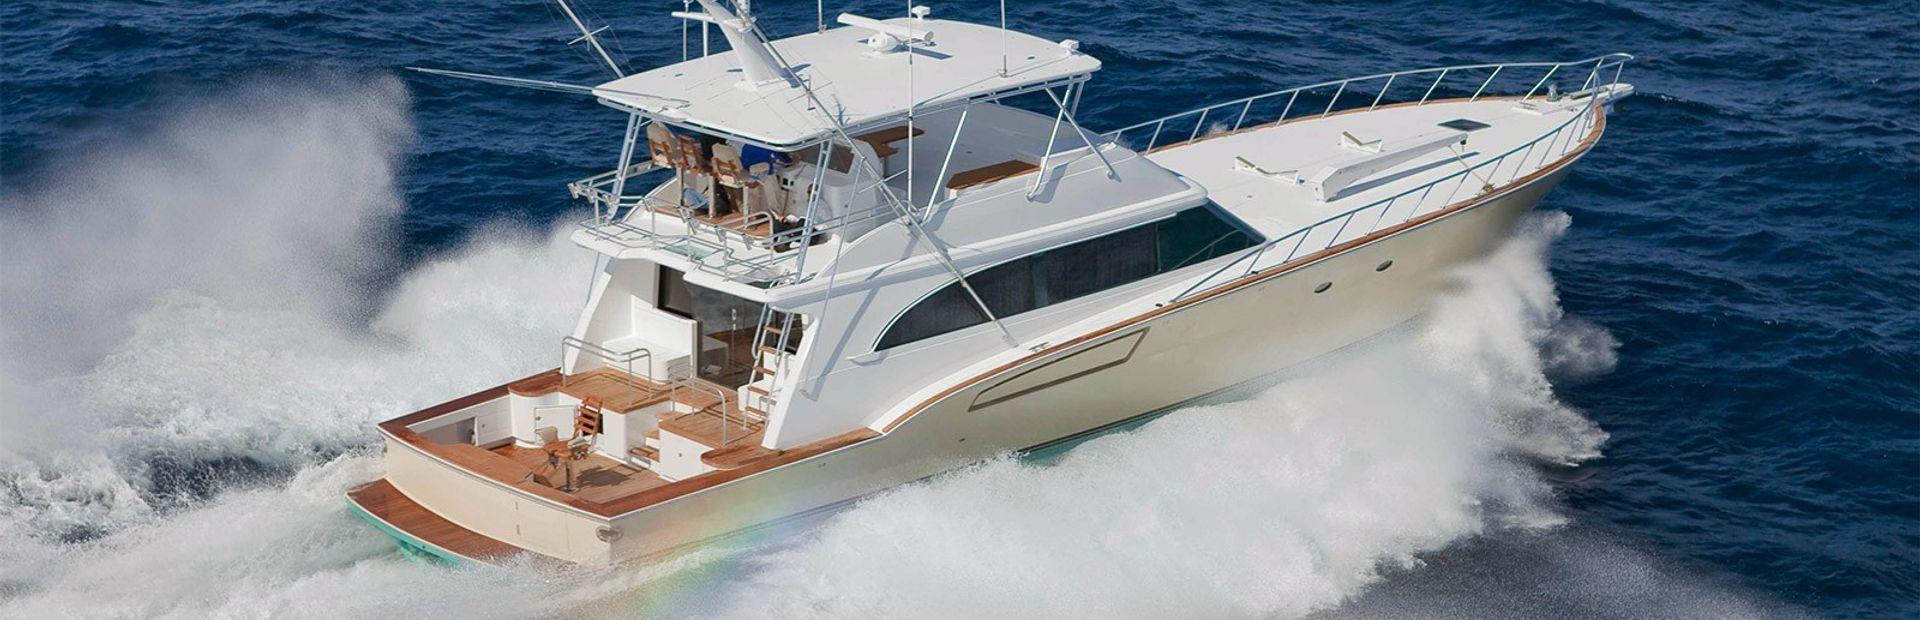 Donzi R-80 Convertible Sportfish Yacht Charter